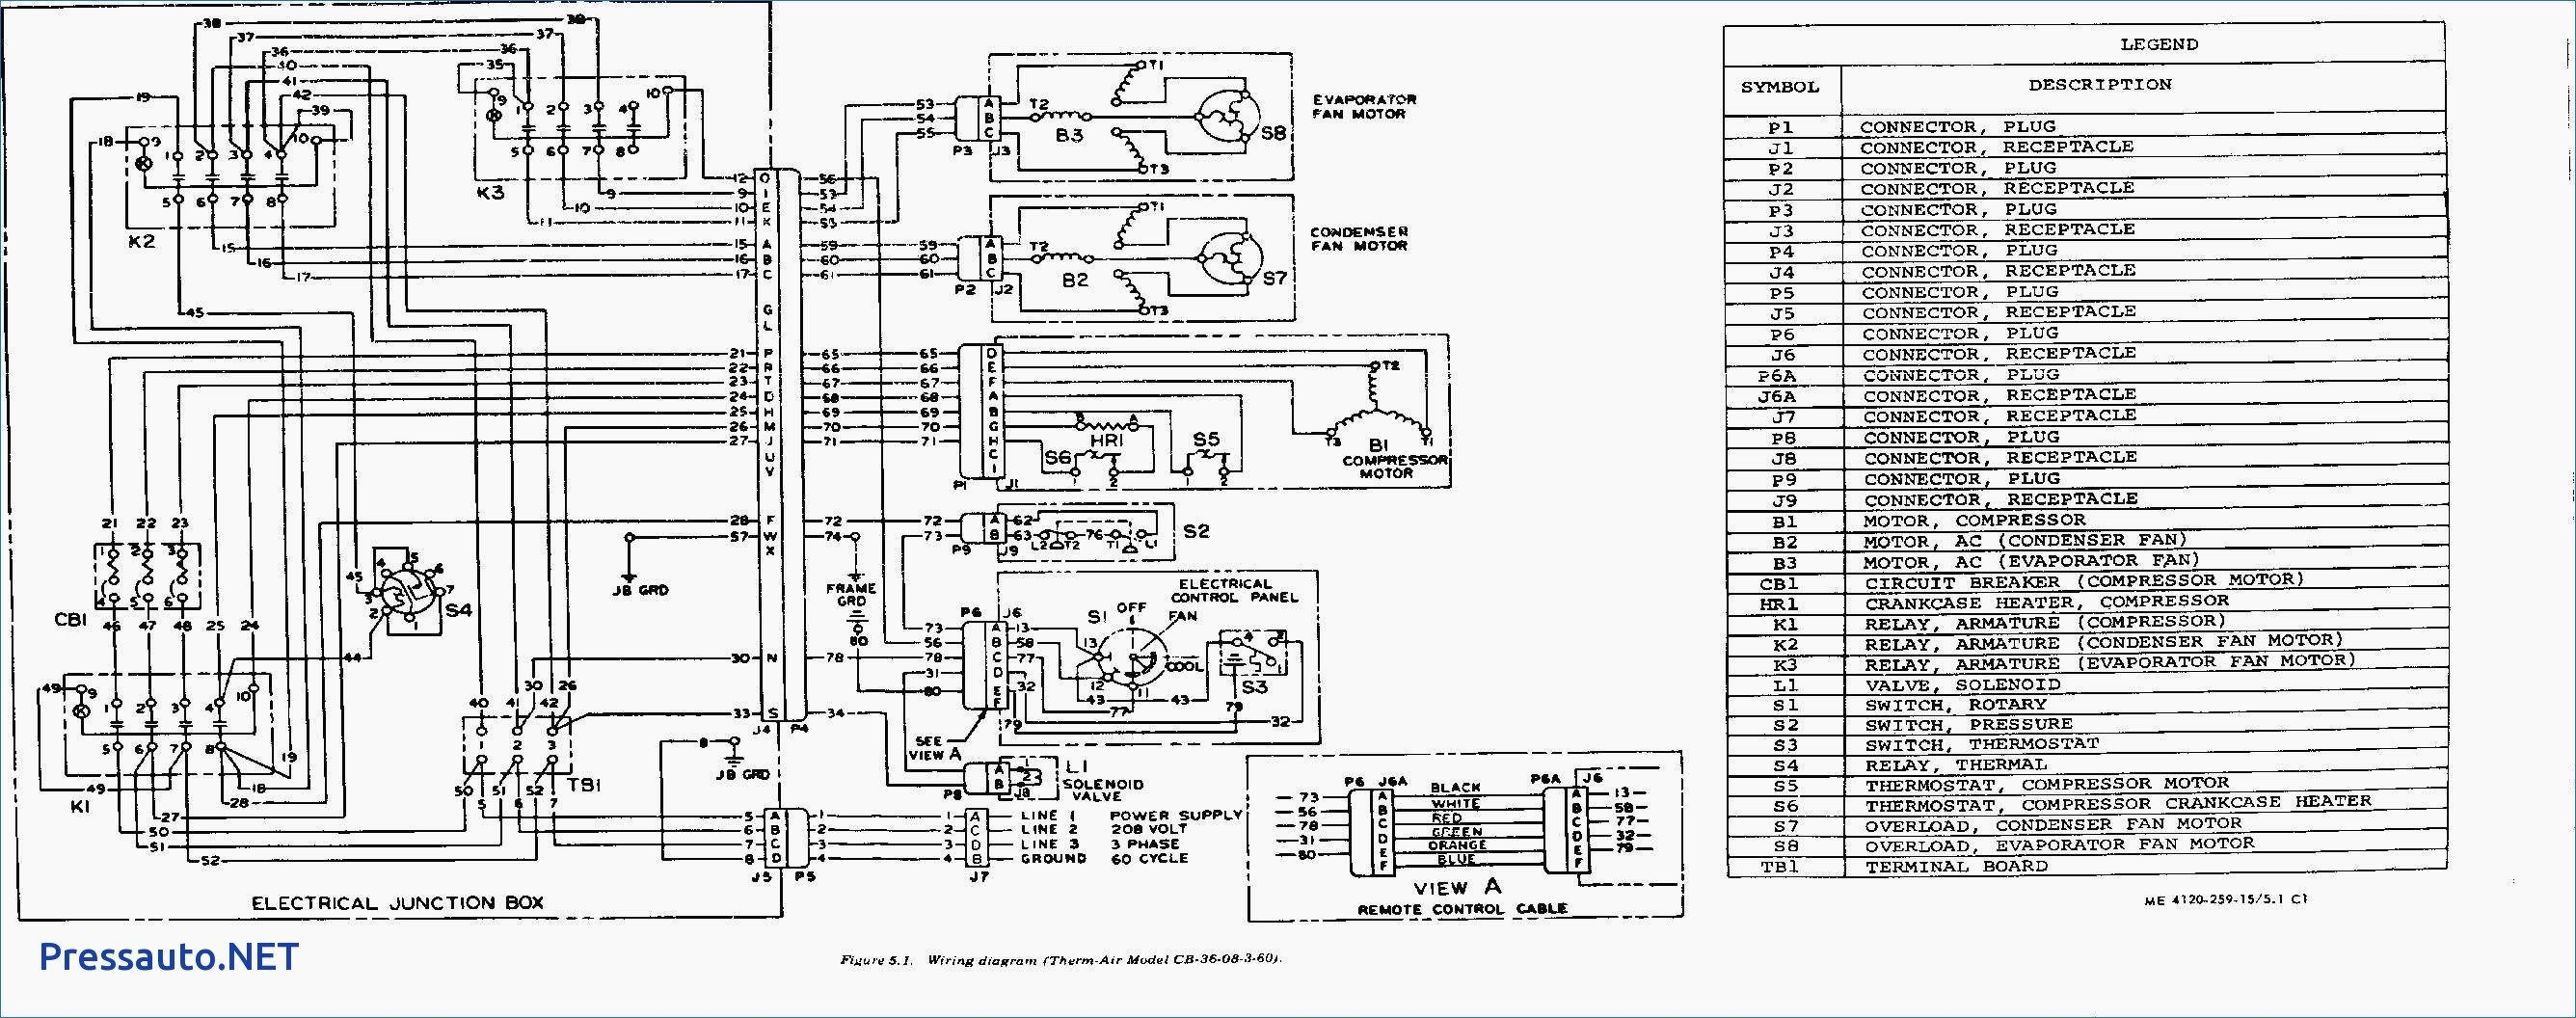 EA_0896] Trane Wiring Diagrams Model Schematic WiringWned Itis Mentra Mohammedshrine Librar Wiring 101